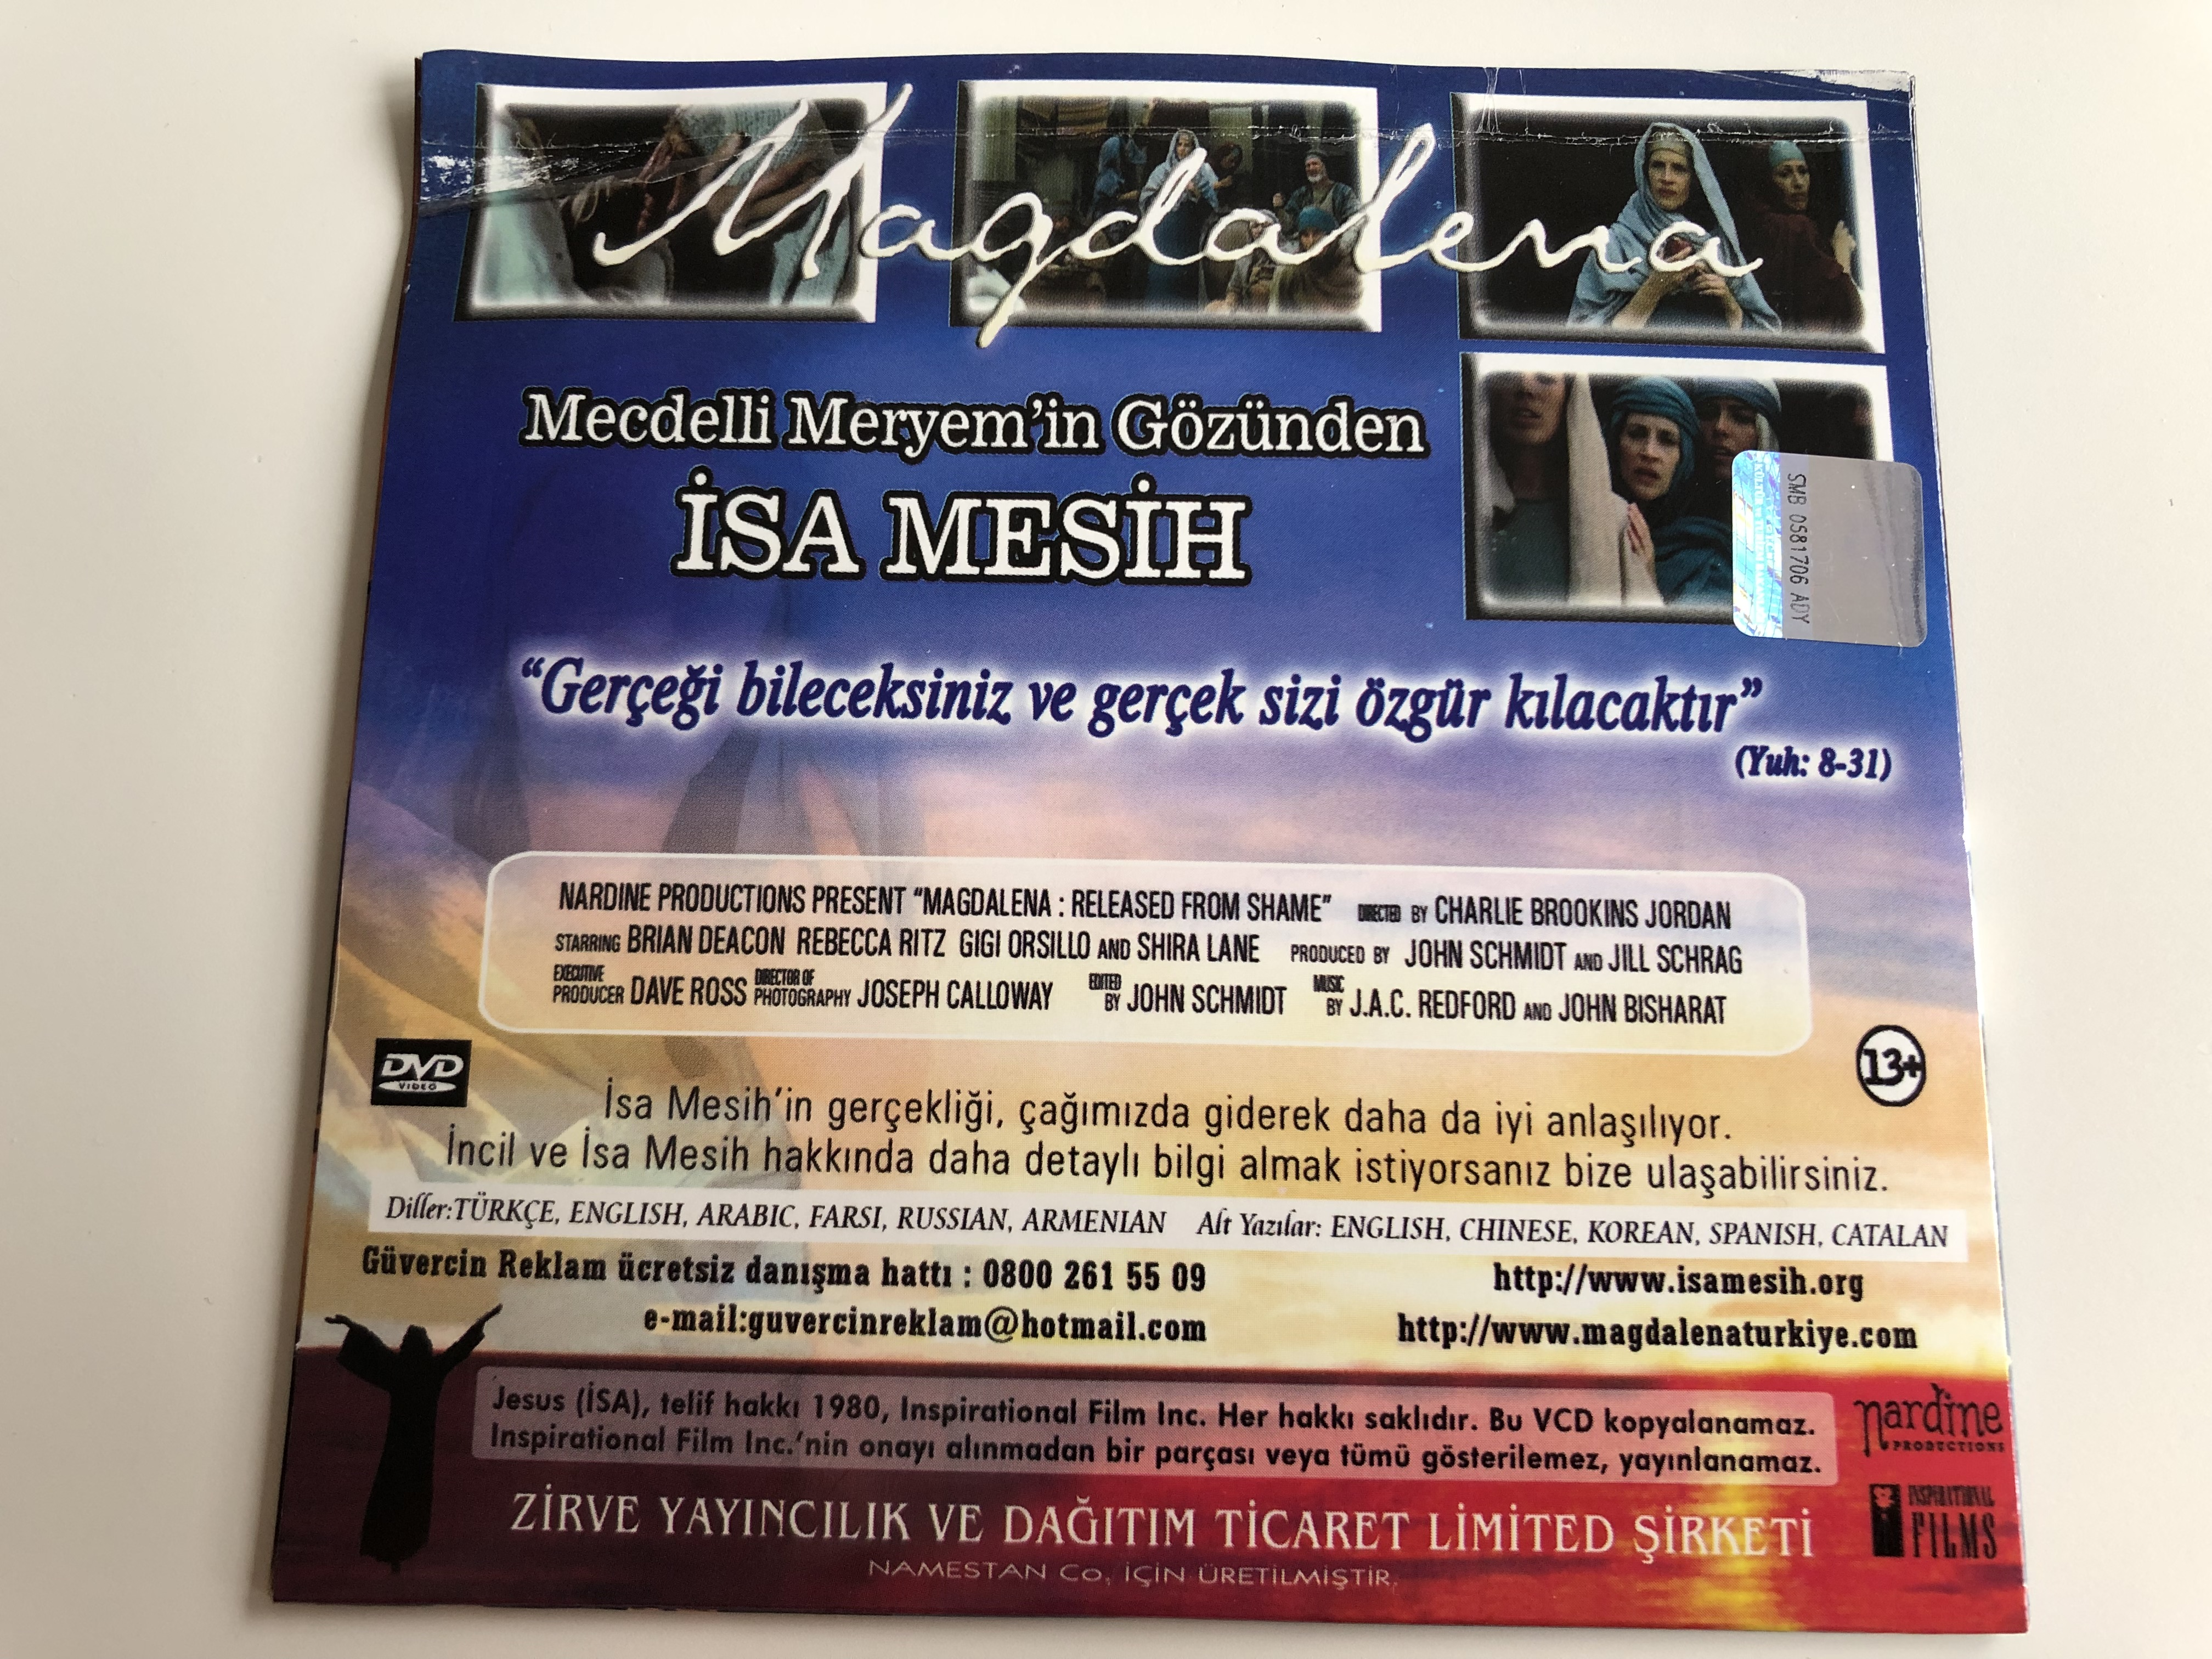 mecdelli-meryem-in-g-z-nden-sa-mesih-dvd-2007-magdalena-released-from-shame-directed-by-charlie-brookins-jordan-starring-brian-deacon-rebecca-ritz-gigi-orsillo-shira-lane-4-.jpg